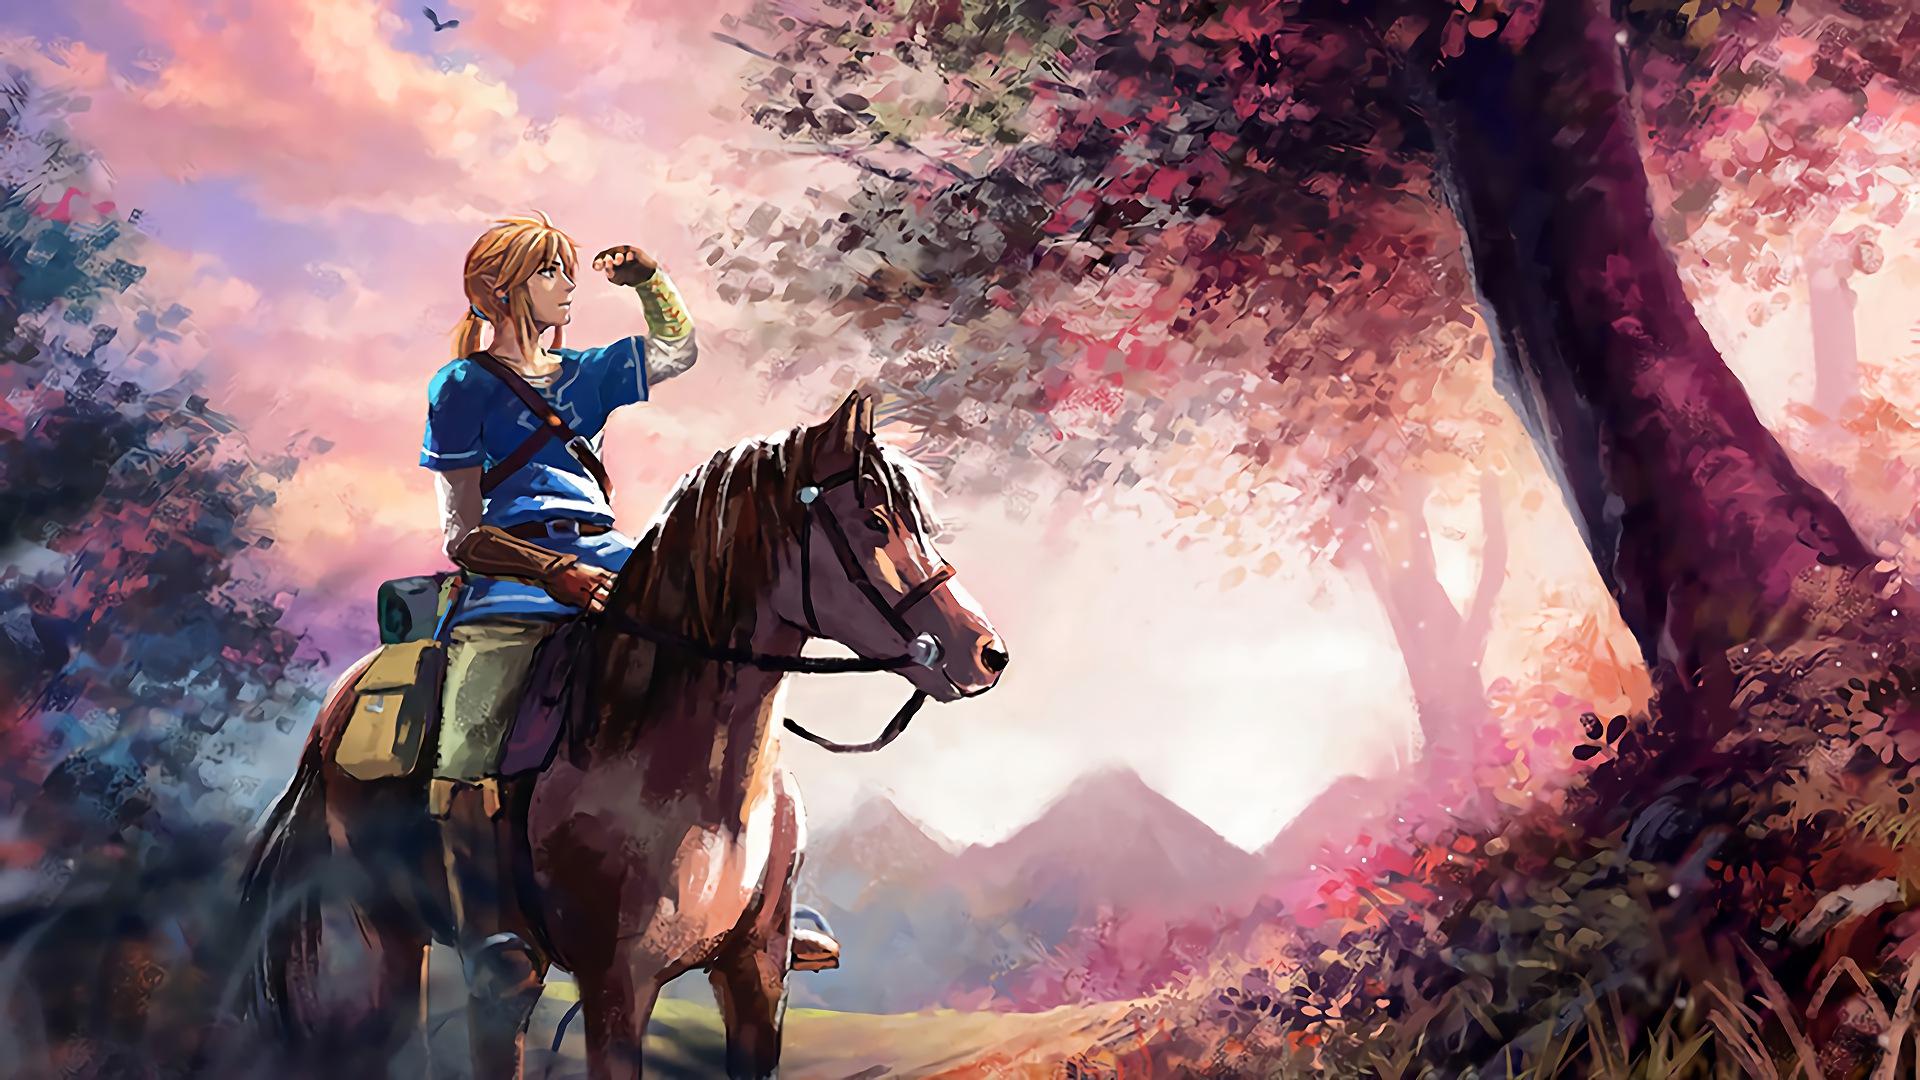 54+ The Legend Of Zelda: Breath Of The Wild HD ...